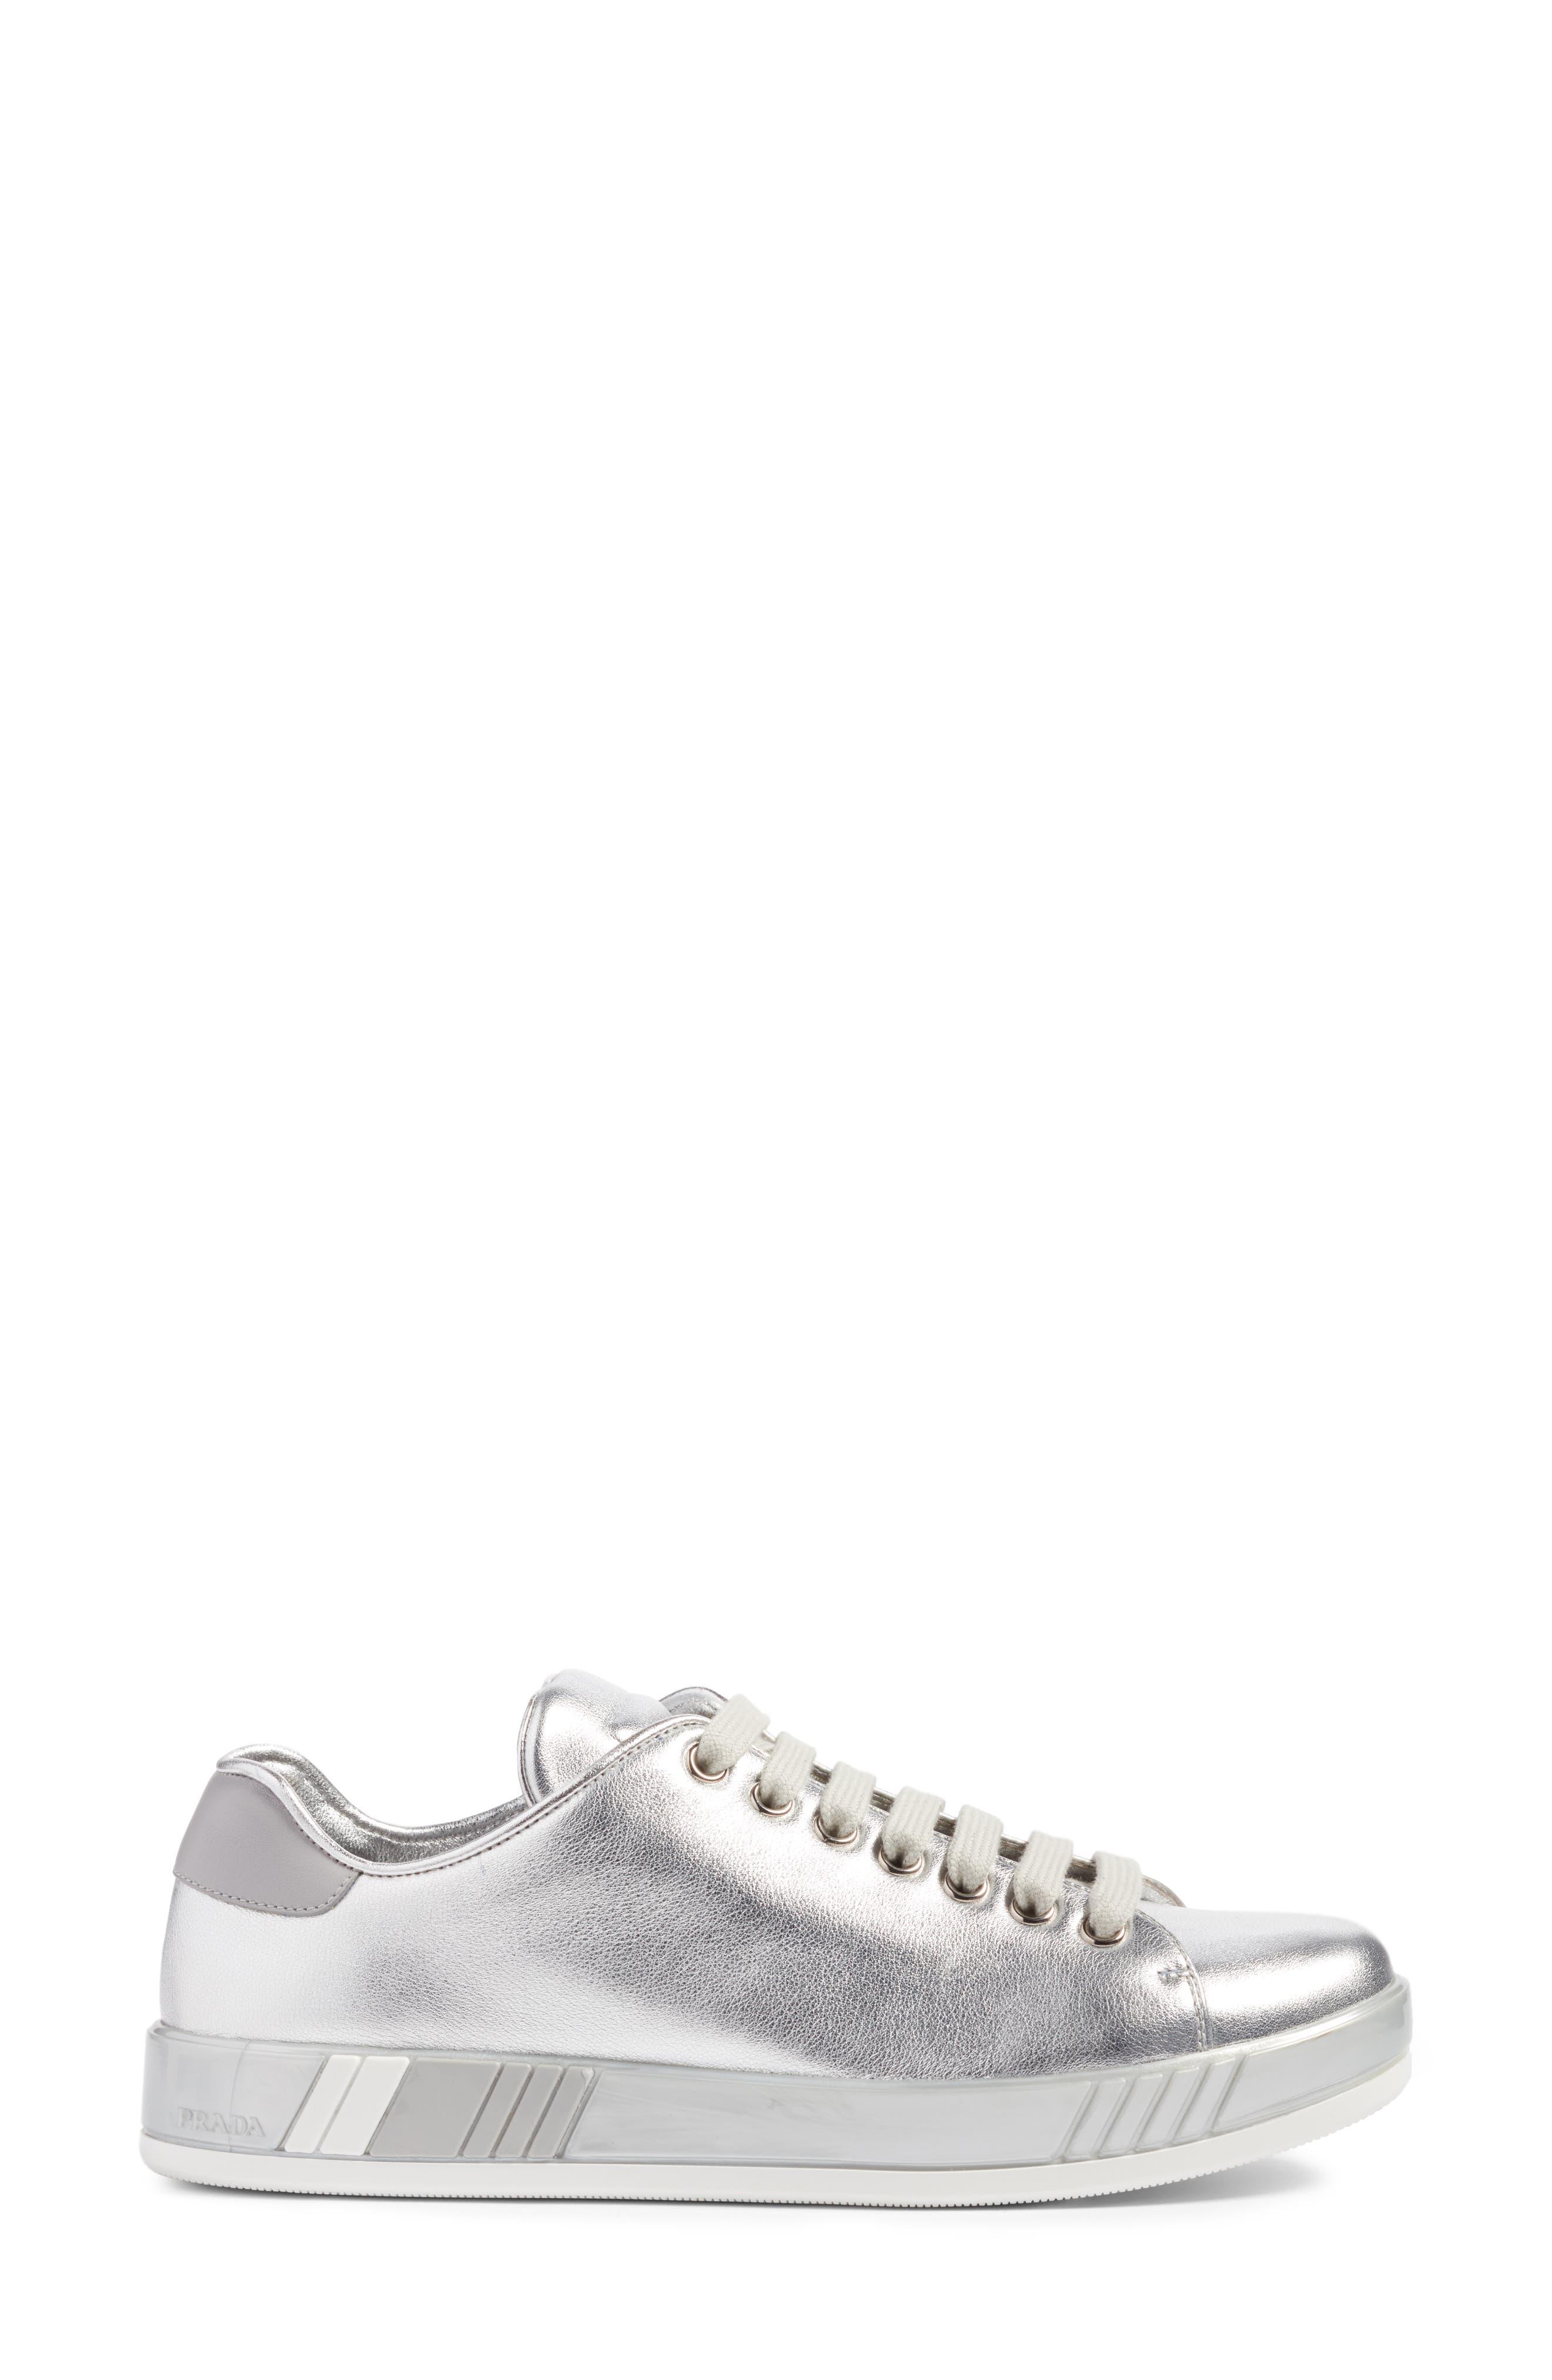 Low Top Sneaker,                             Alternate thumbnail 3, color,                             Metallic Silver